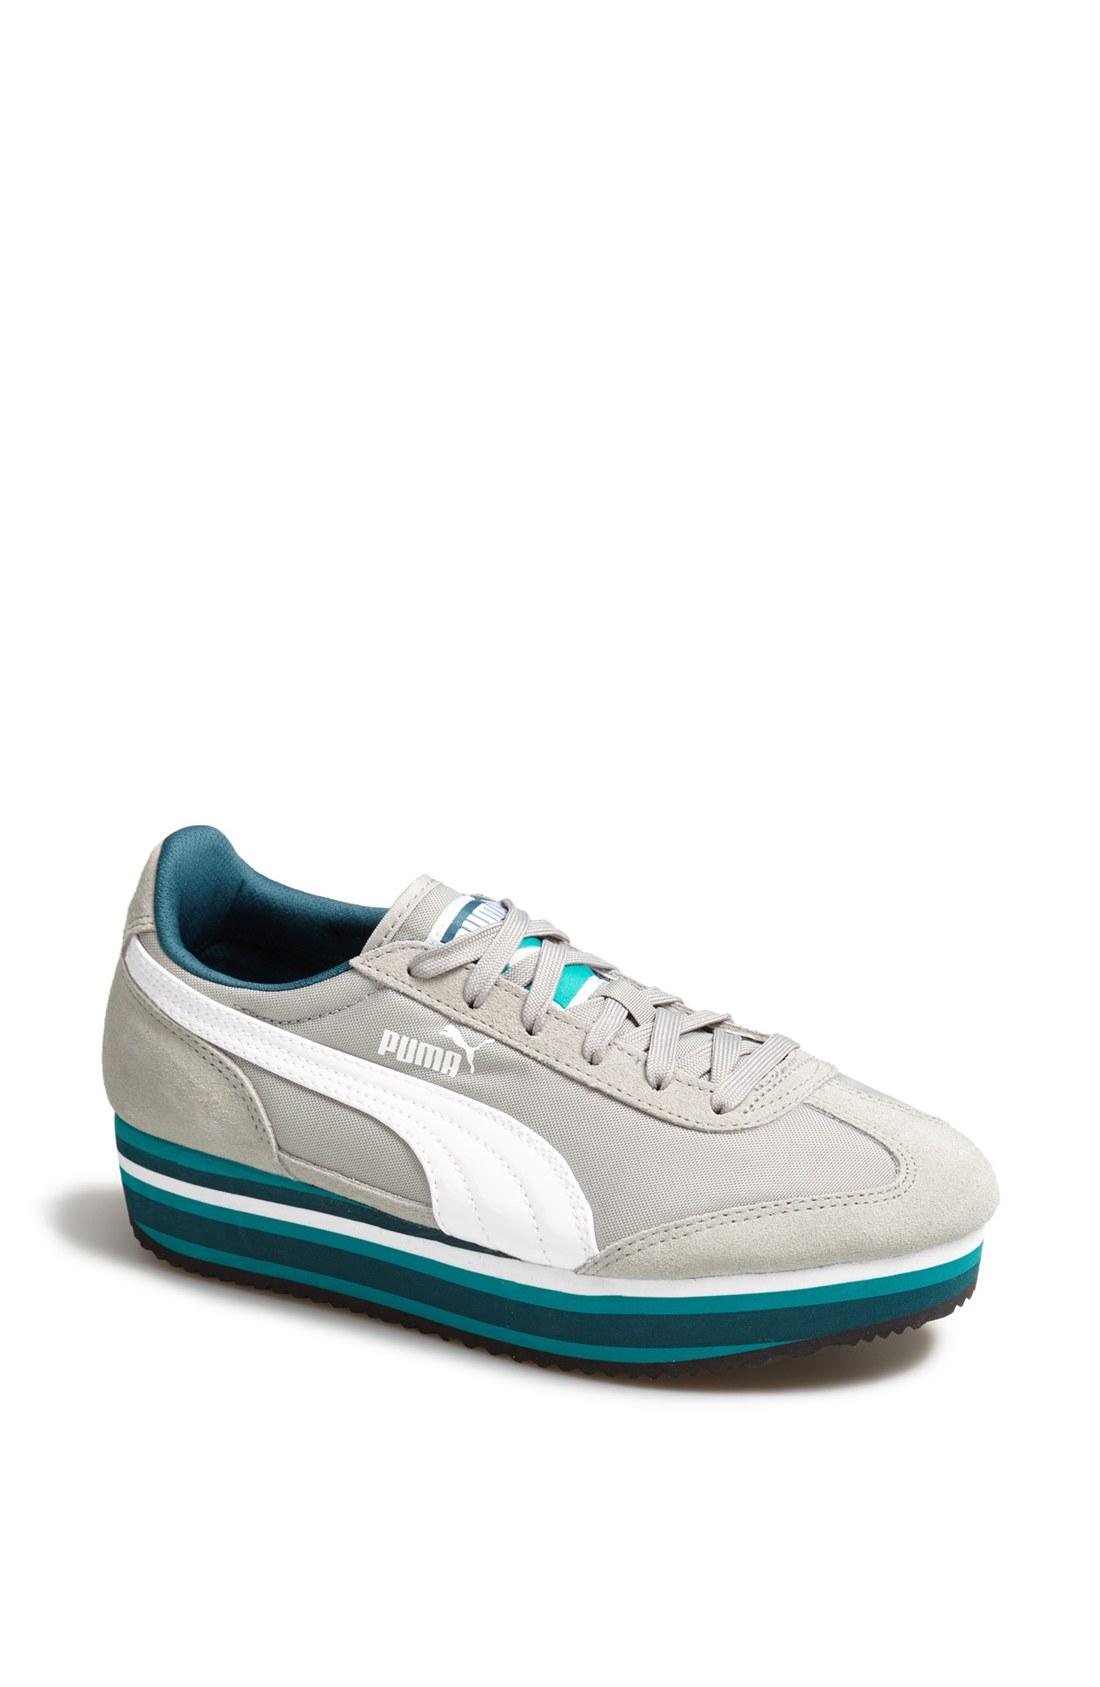 puma sf 77 platform sneaker in blue limestone grey white lyst. Black Bedroom Furniture Sets. Home Design Ideas